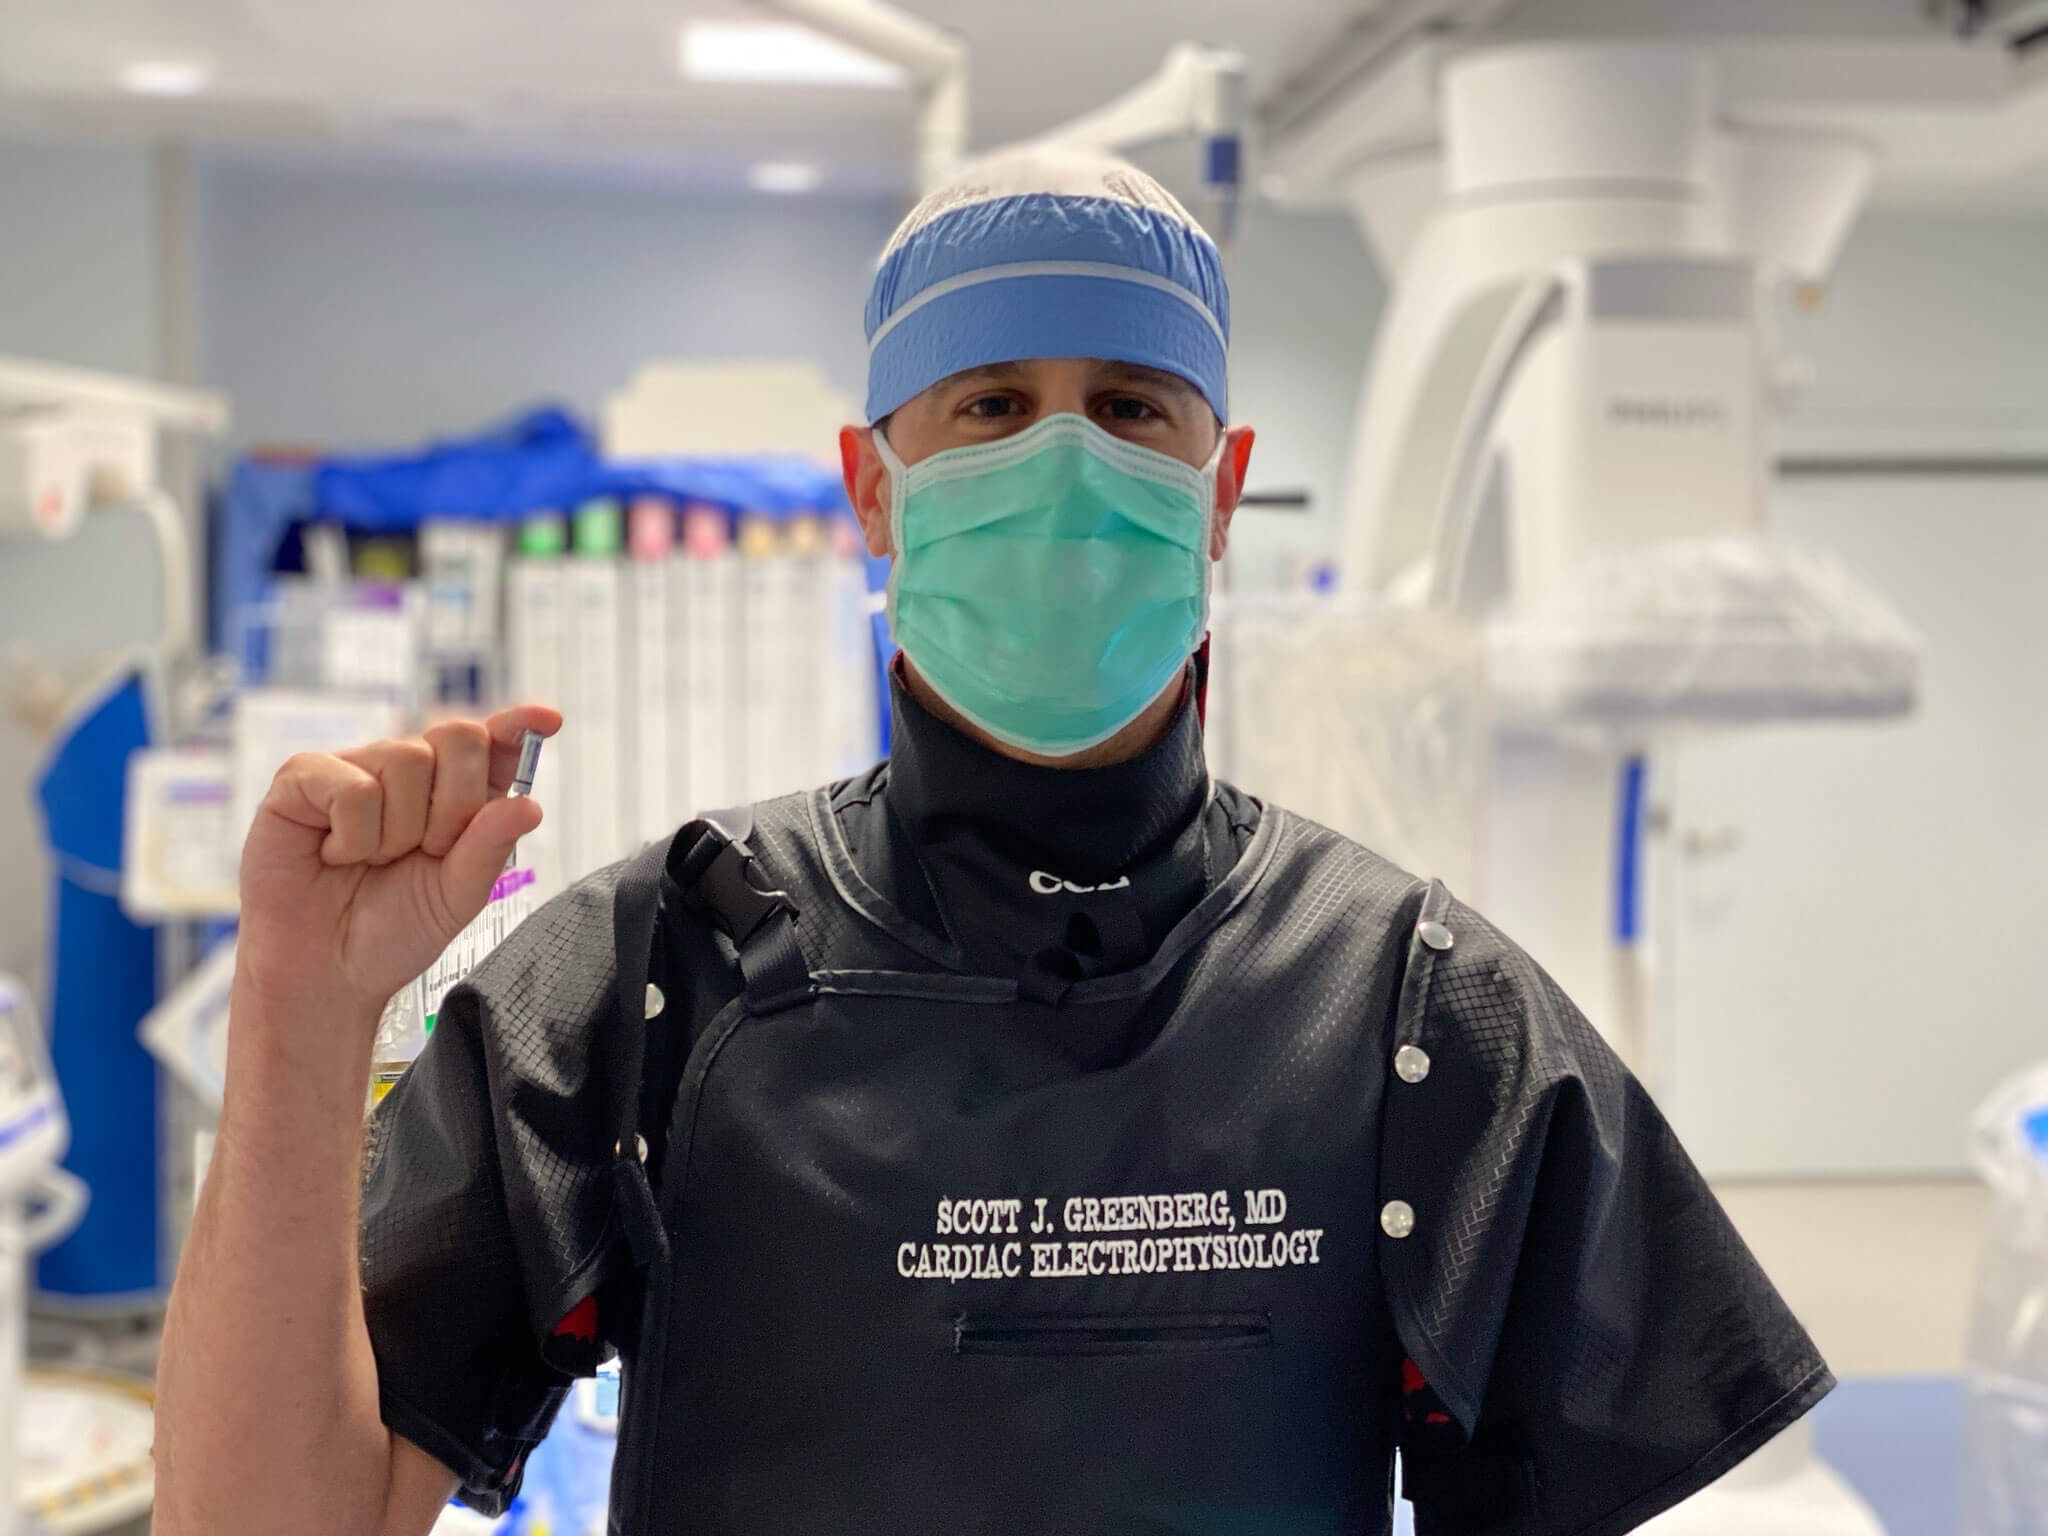 Dr.ScottGreenberg